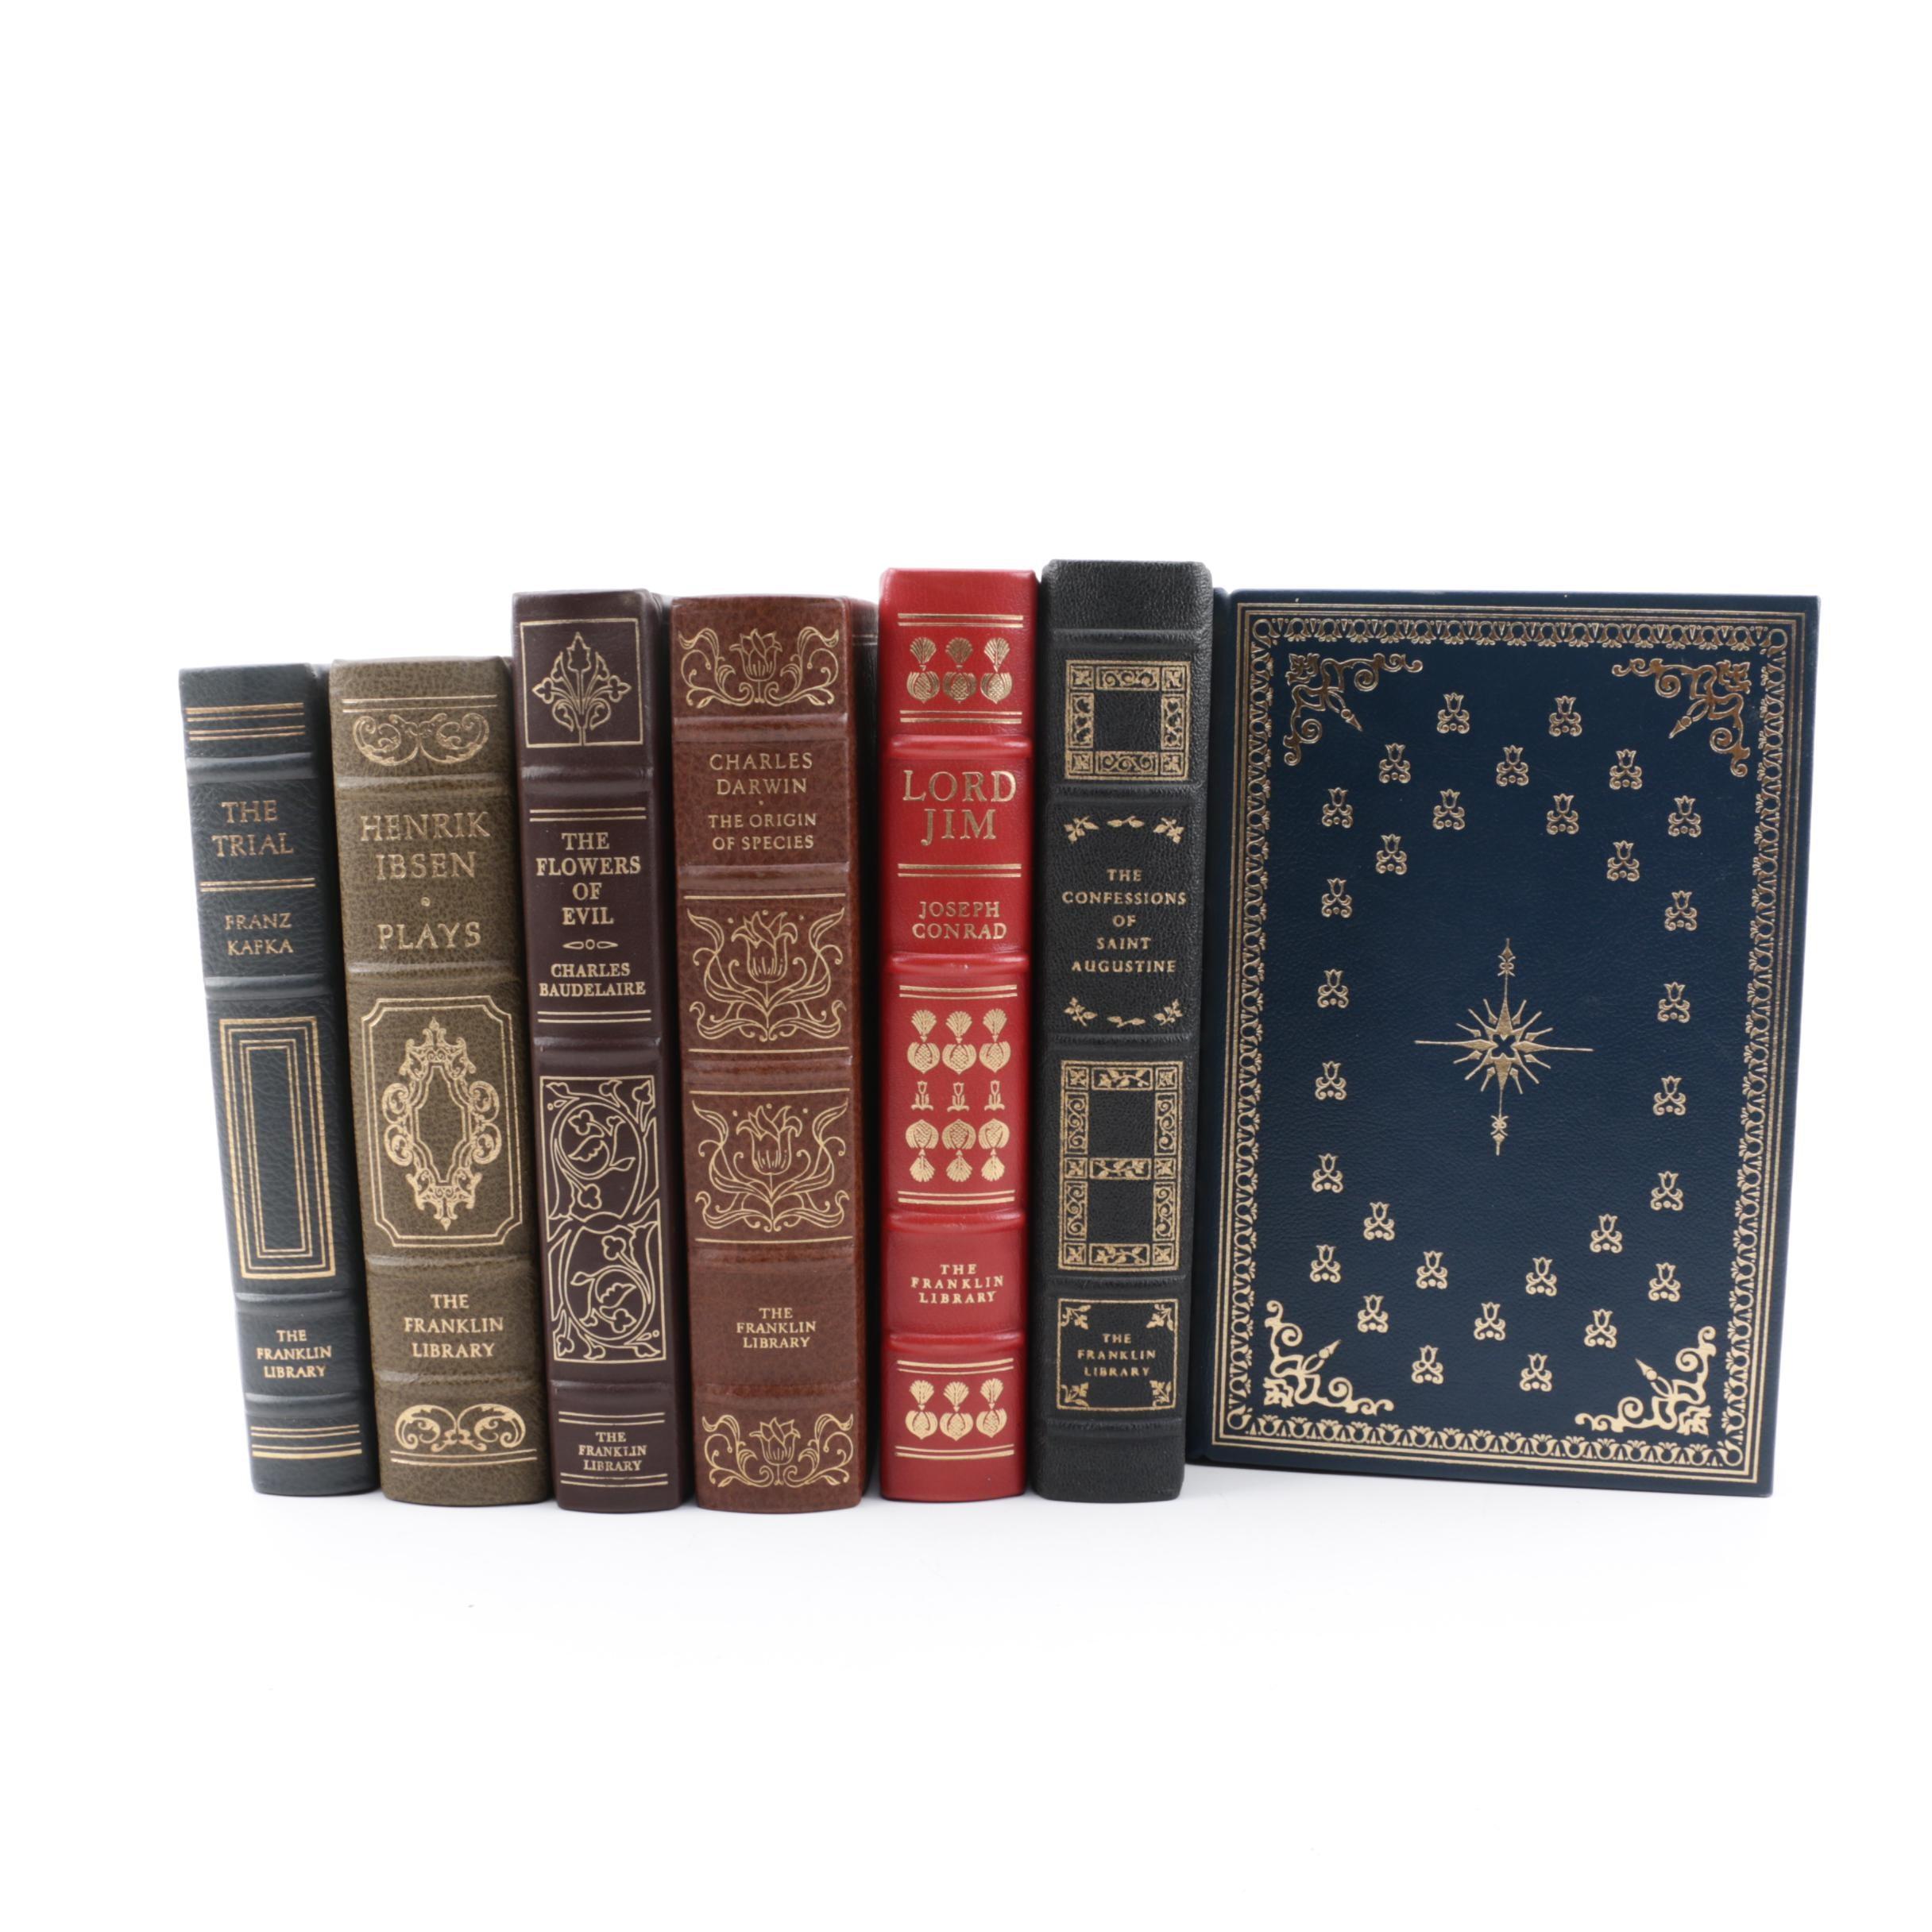 Franklin Library Editions including Robert Louis Stevenson